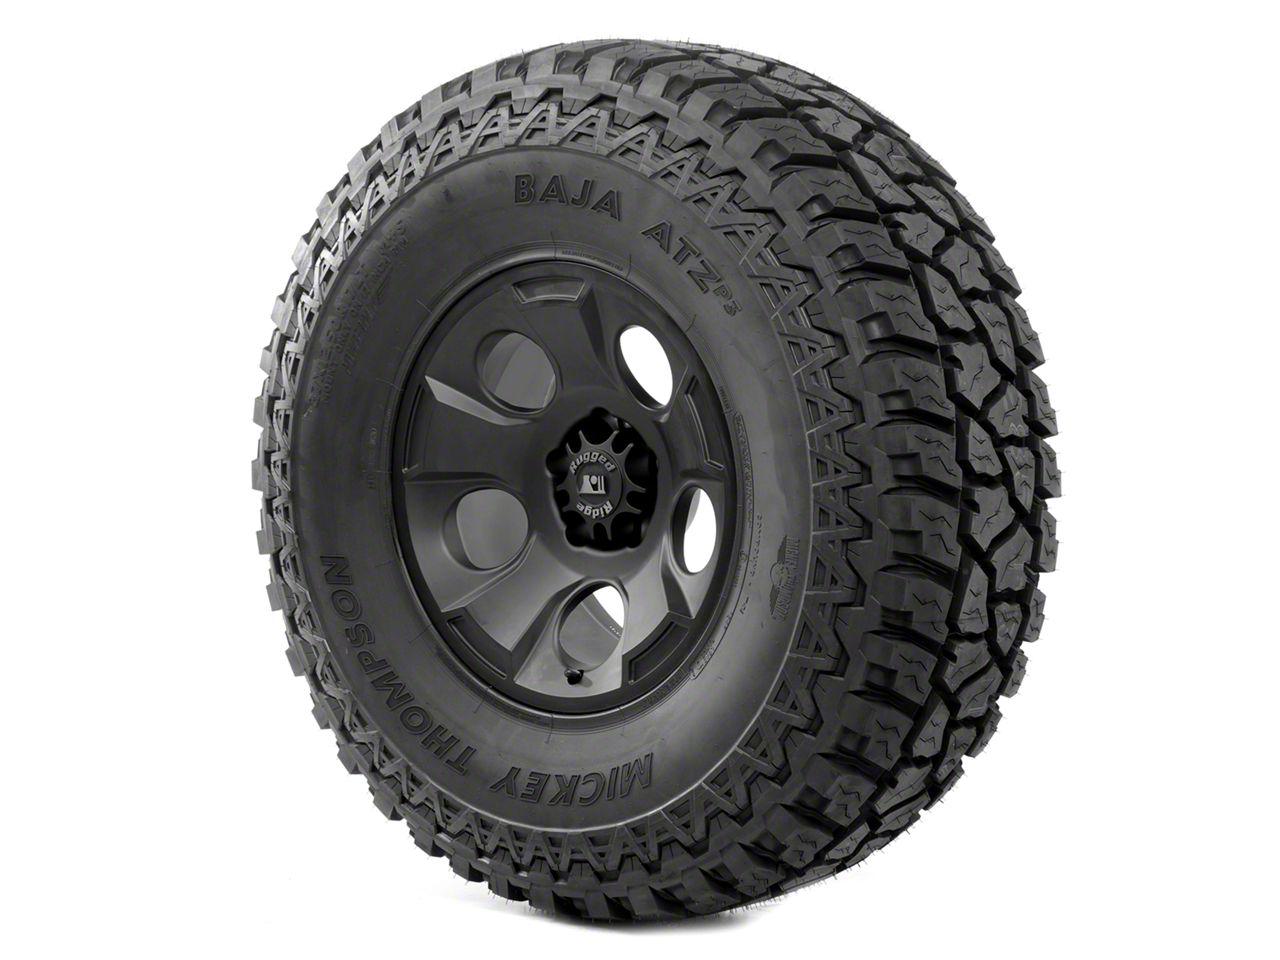 Rugged Ridge Drakon Wheel 17x9 Black Satin and Mickey Thompson ATZ P3 37x12.50x17 Tire Kit (13-18 Jeep Wrangler JK; 2018 Jeep Wrangler JL)